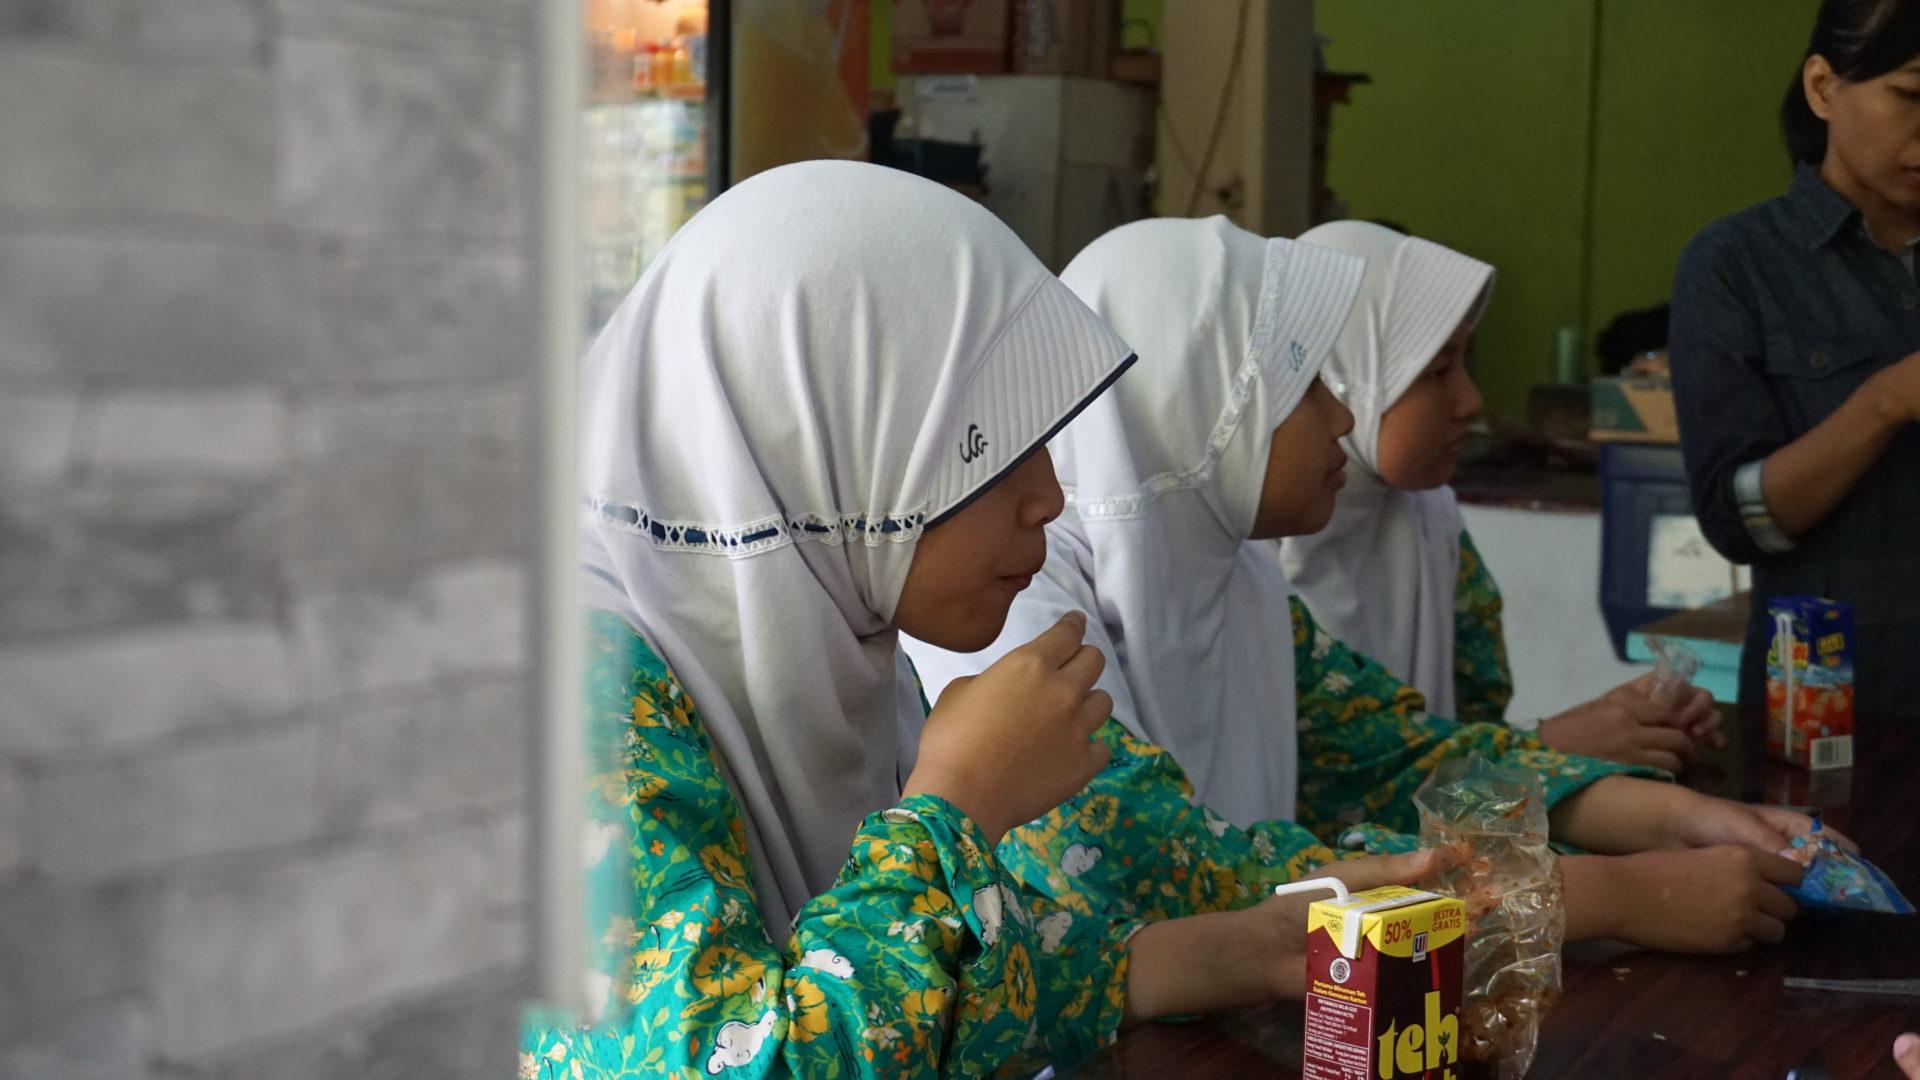 Hijab-Pflicht in einer High-School in Cibinong © Andreas Harsono